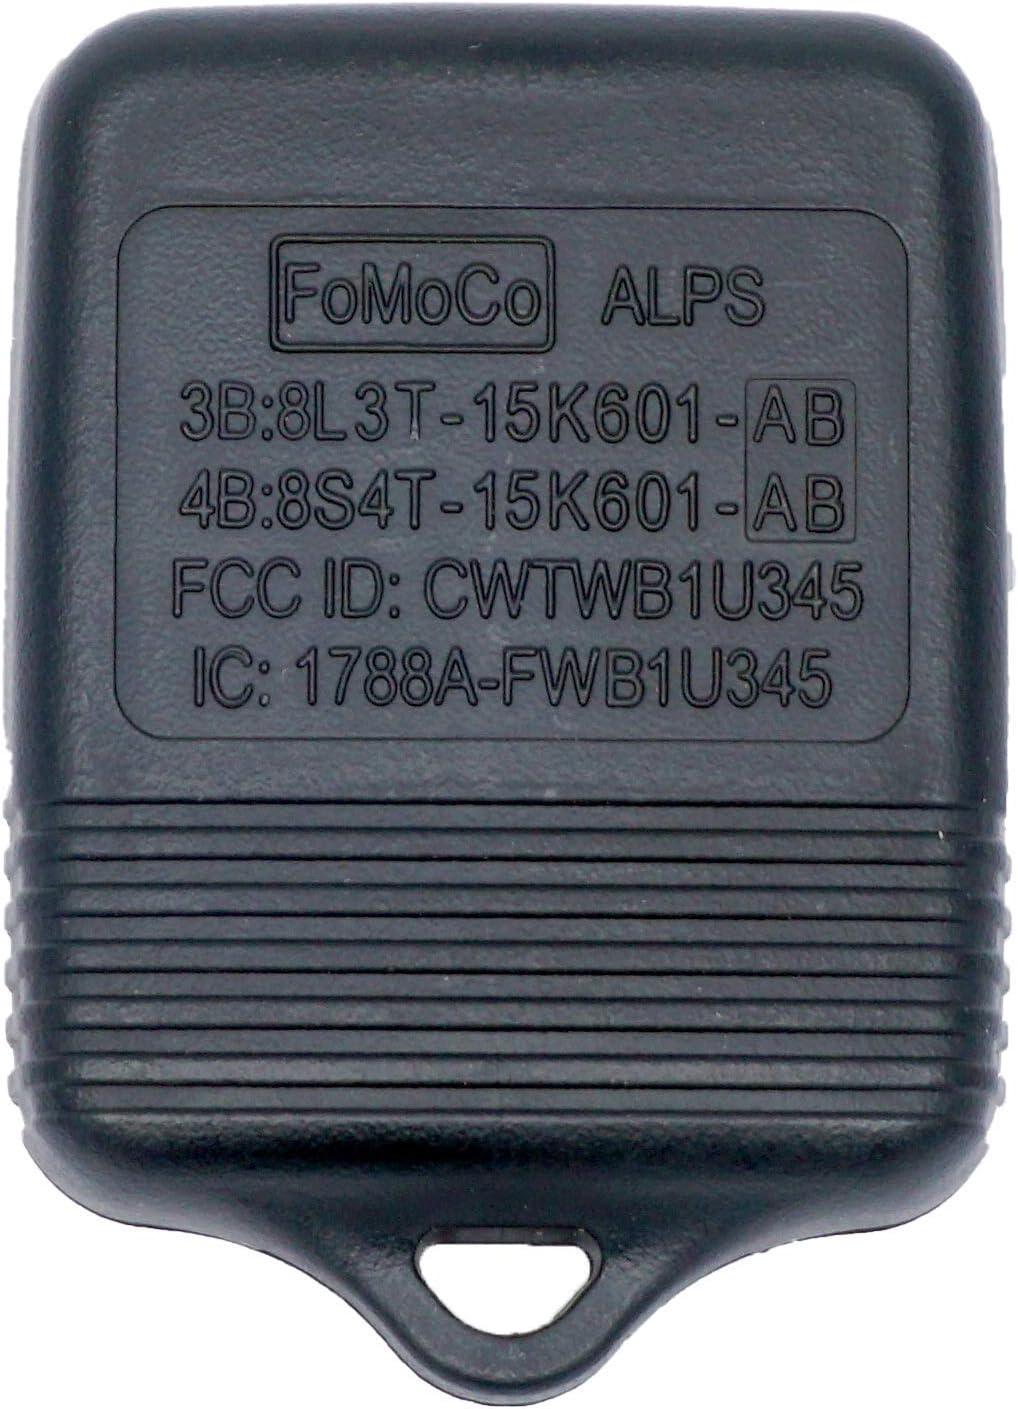 Fits Ford Lincoln Mercury 3B:8L3T-15K601-AB OEM 4 Button Key Fob